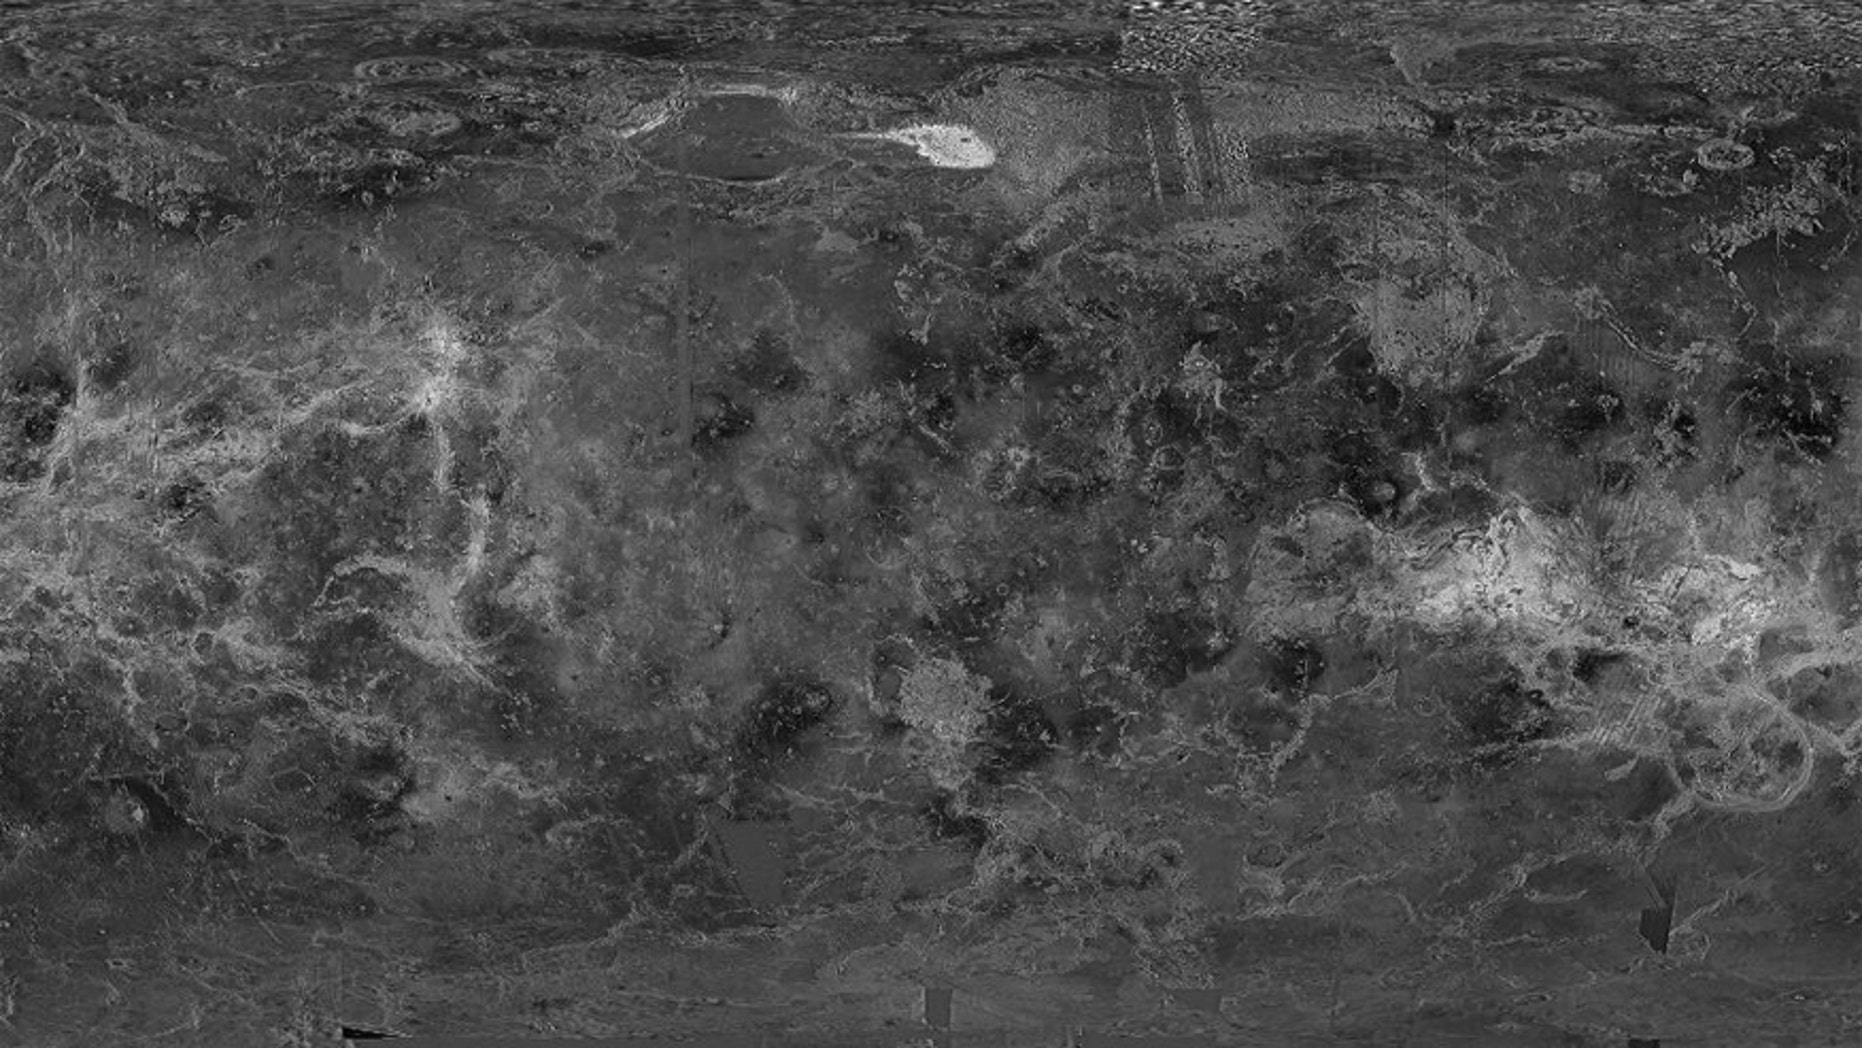 Venus image from NASA's Magellan probe – Venus Global GIS Mapping Application (usgs.gov)